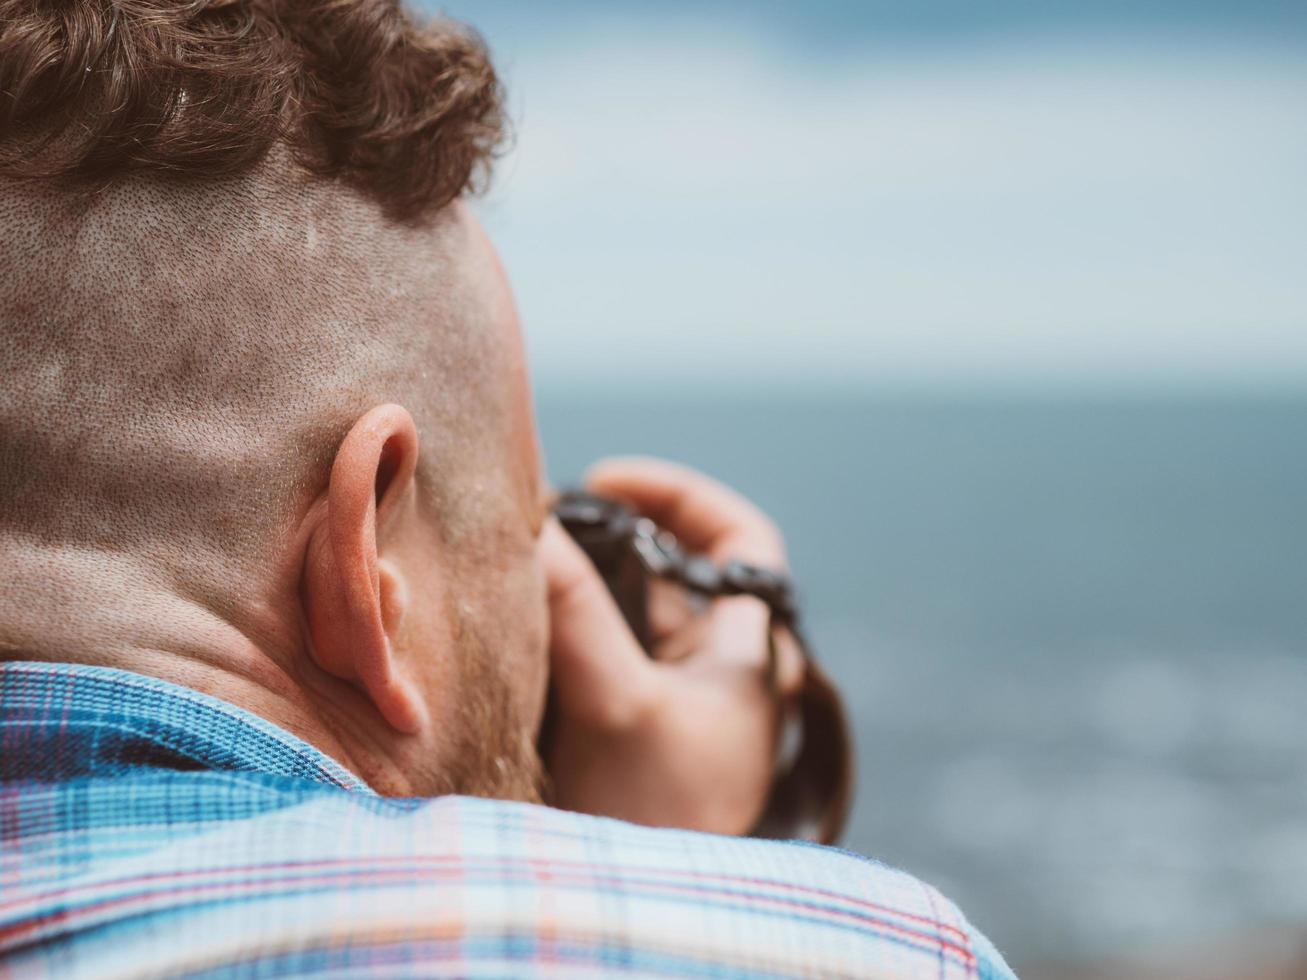 mâle tient la caméra vers la mer photo